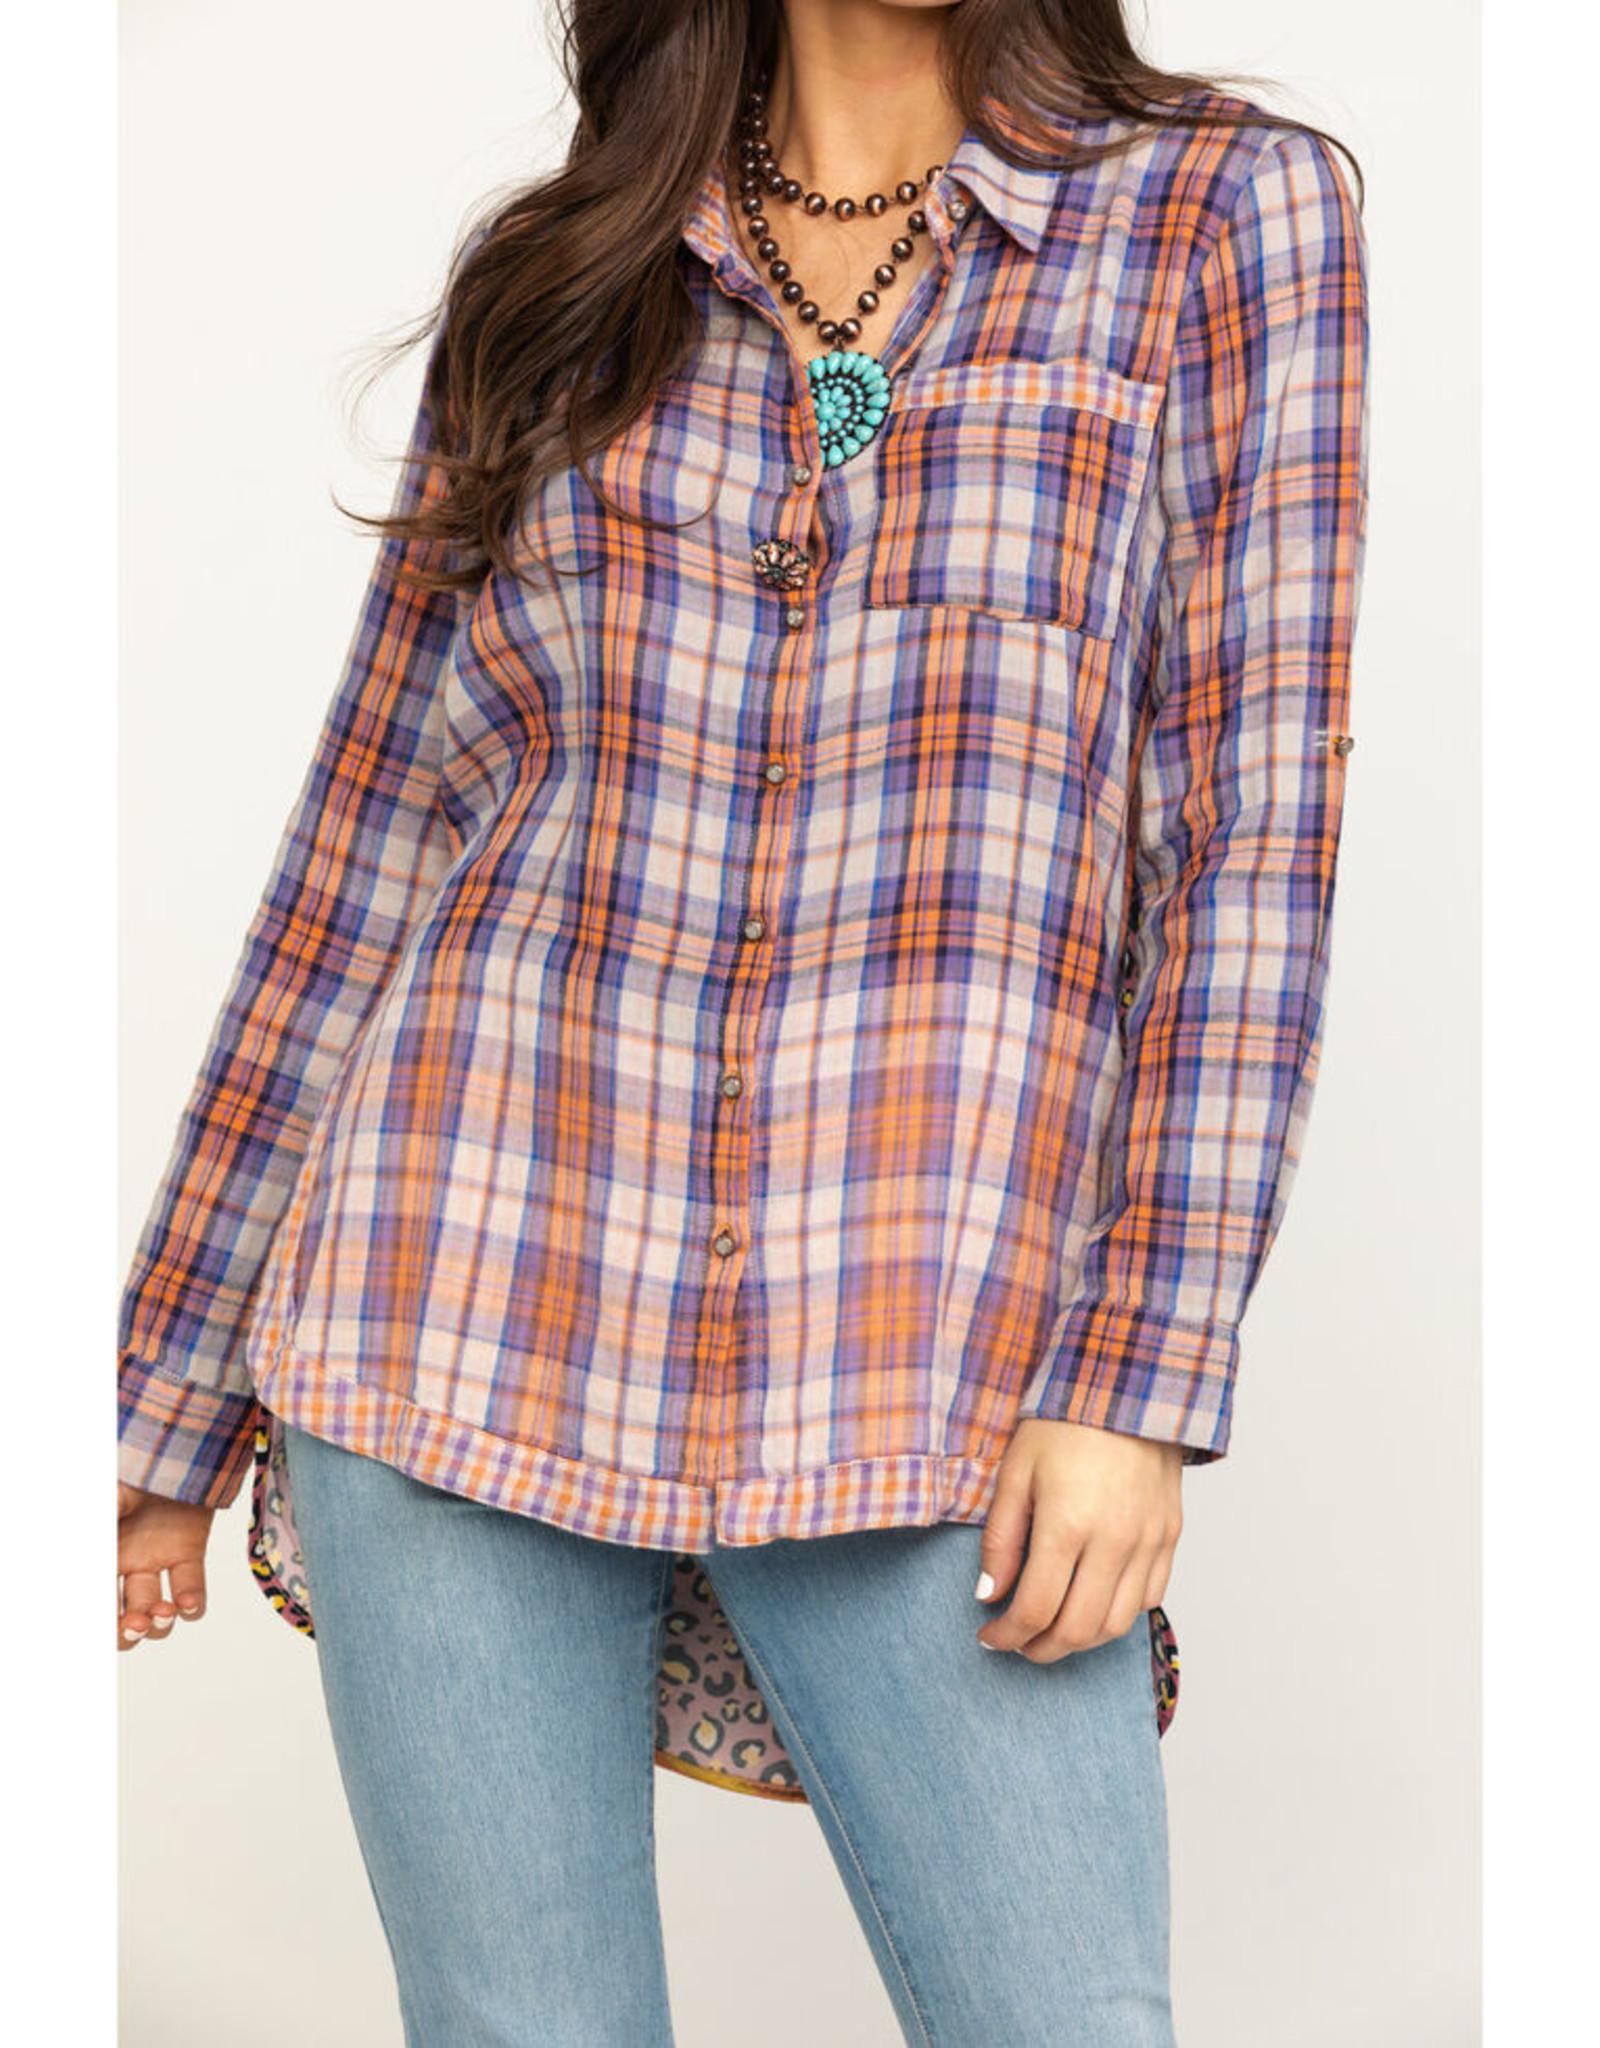 Leona Button Up Shirt